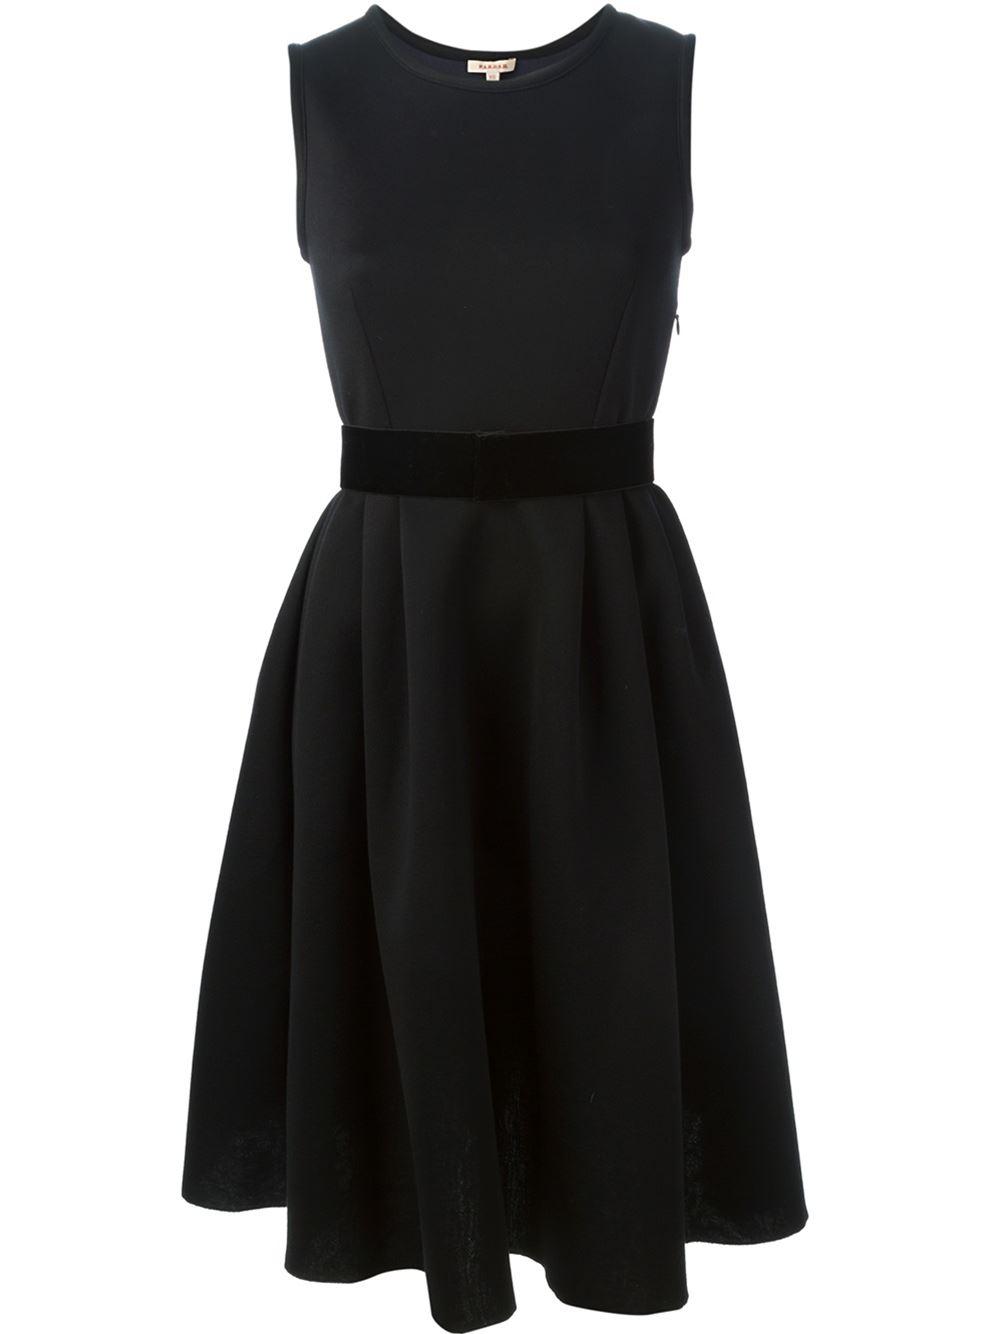 Emil dress, £248.22, P.A.R.O.S.H. www.farfetch.com